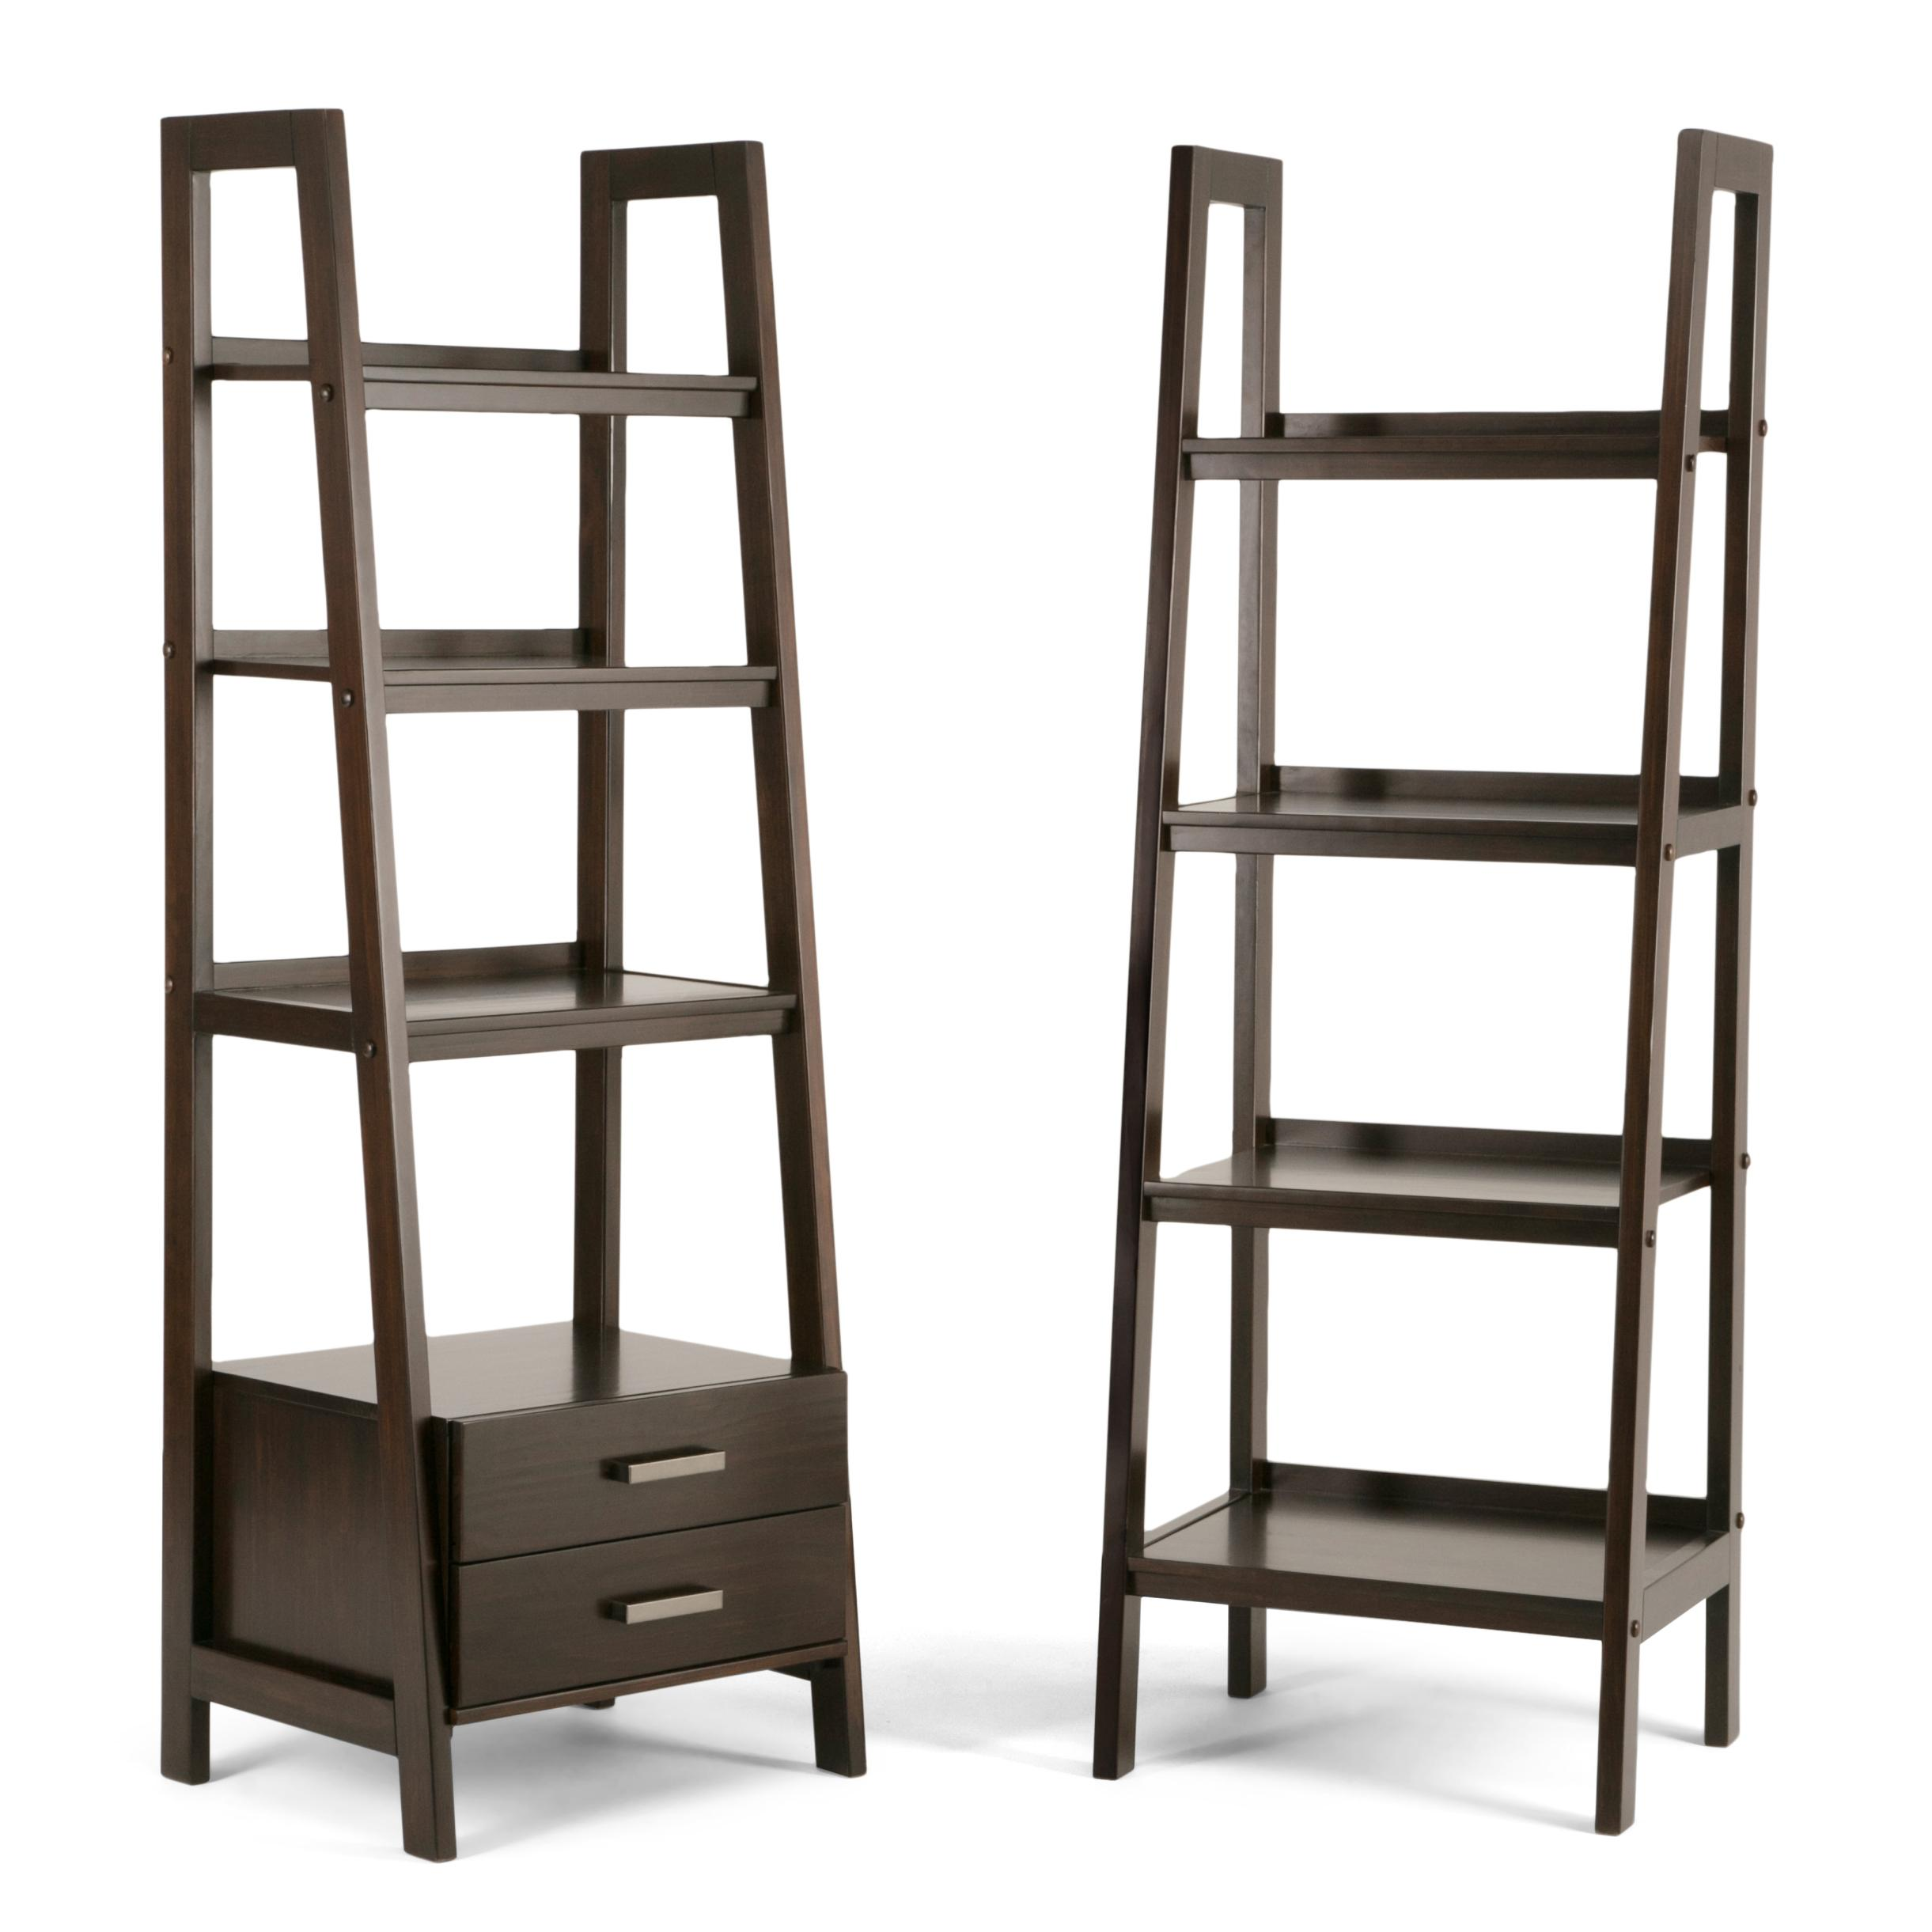 Kitchen Ladder Shelf: Amazon.com: Simpli Home 3AXCSAW-05-BR Sawhorse Solid Wood